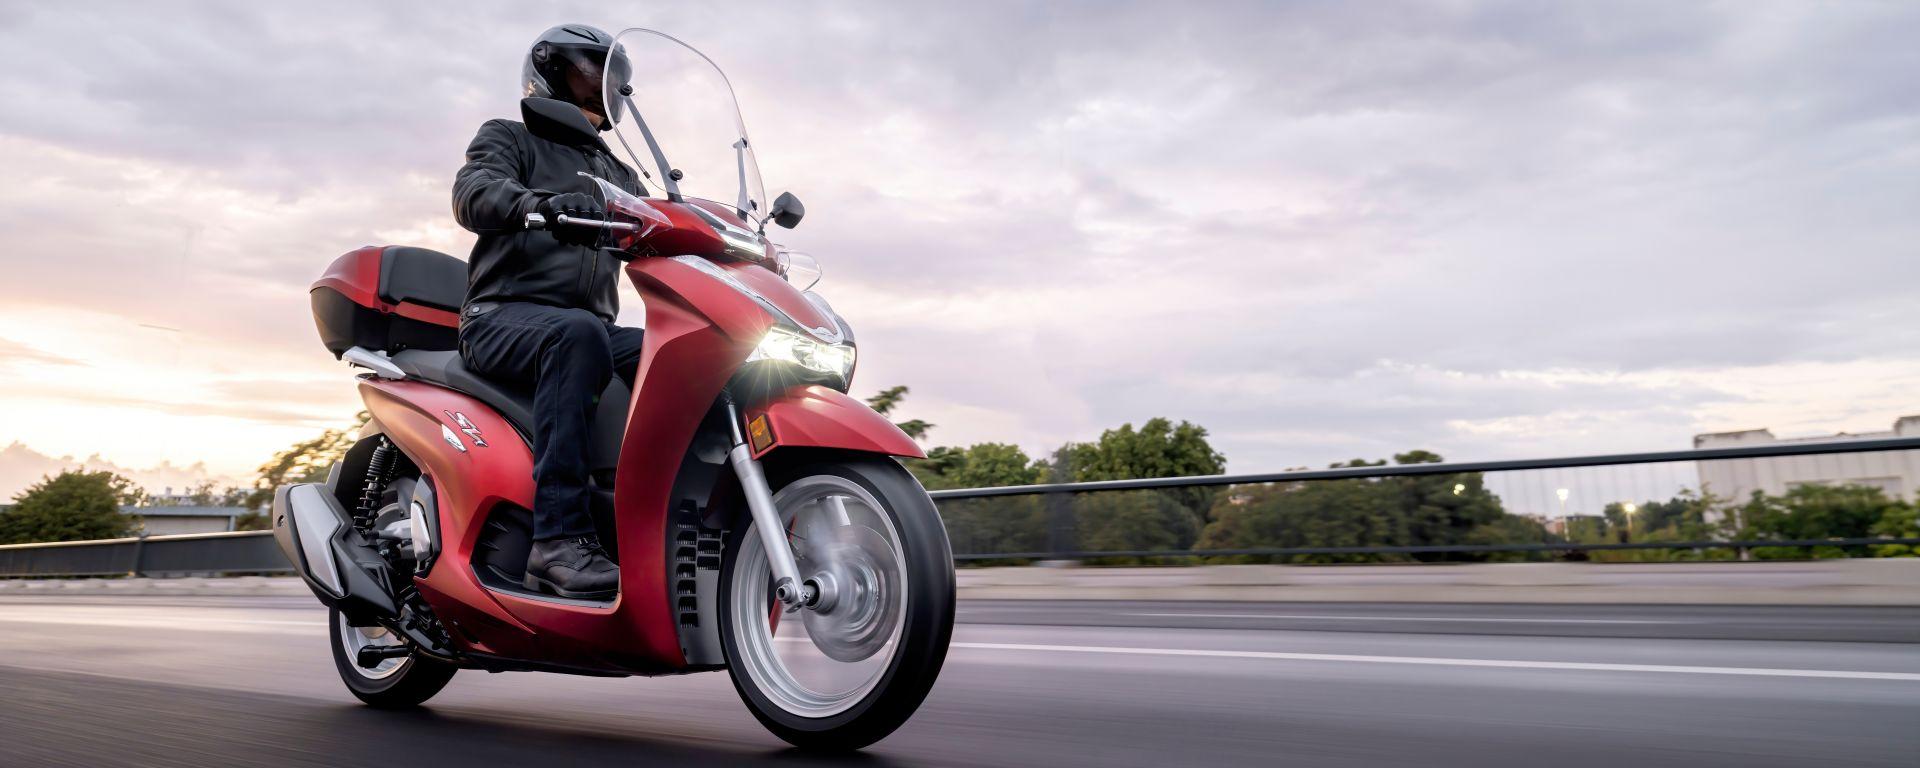 Honda SH350i 2021: 3/4 anteriore